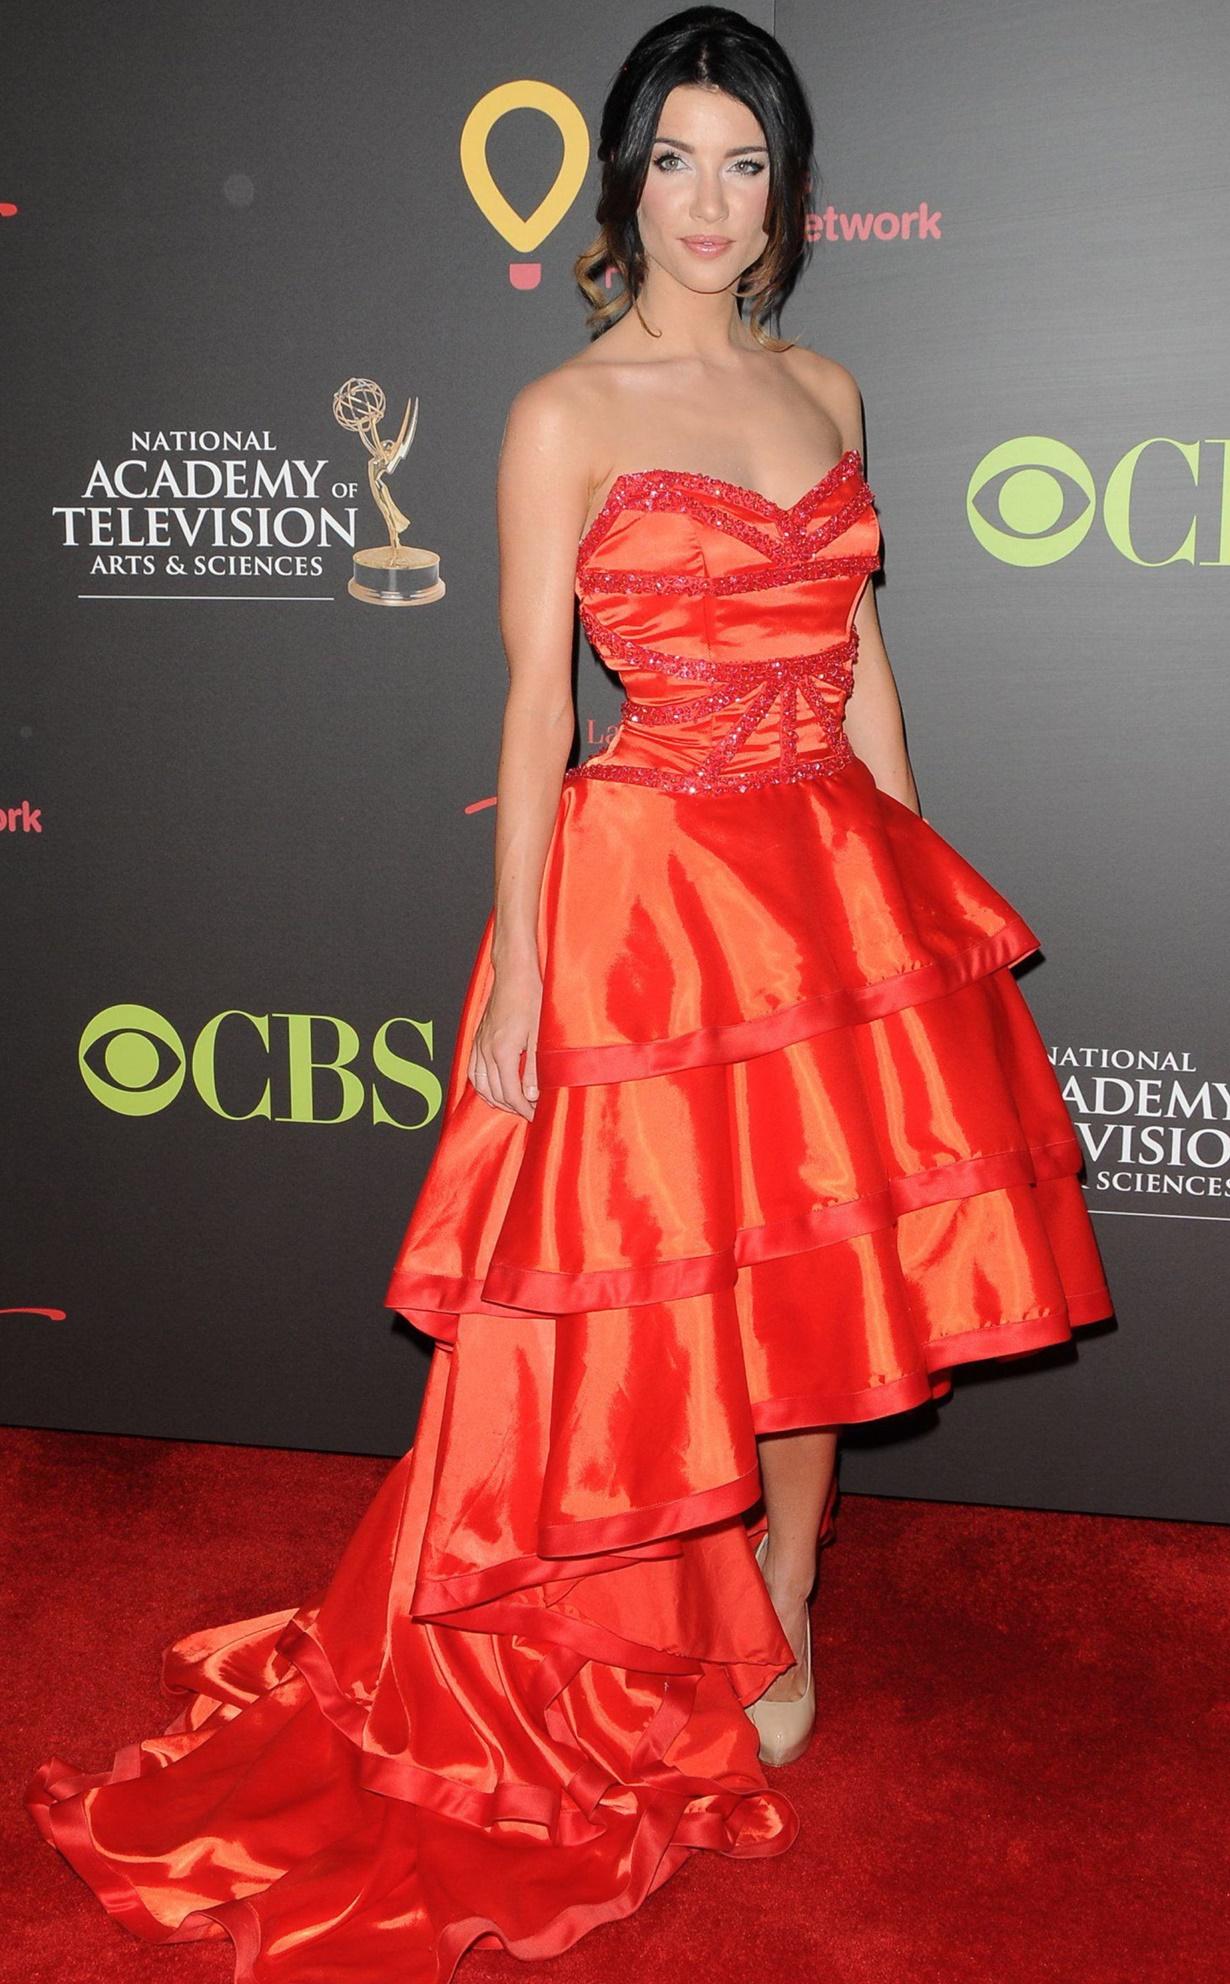 Jacqueline MacInnes Wood Daytime Emmys 2011 B&B